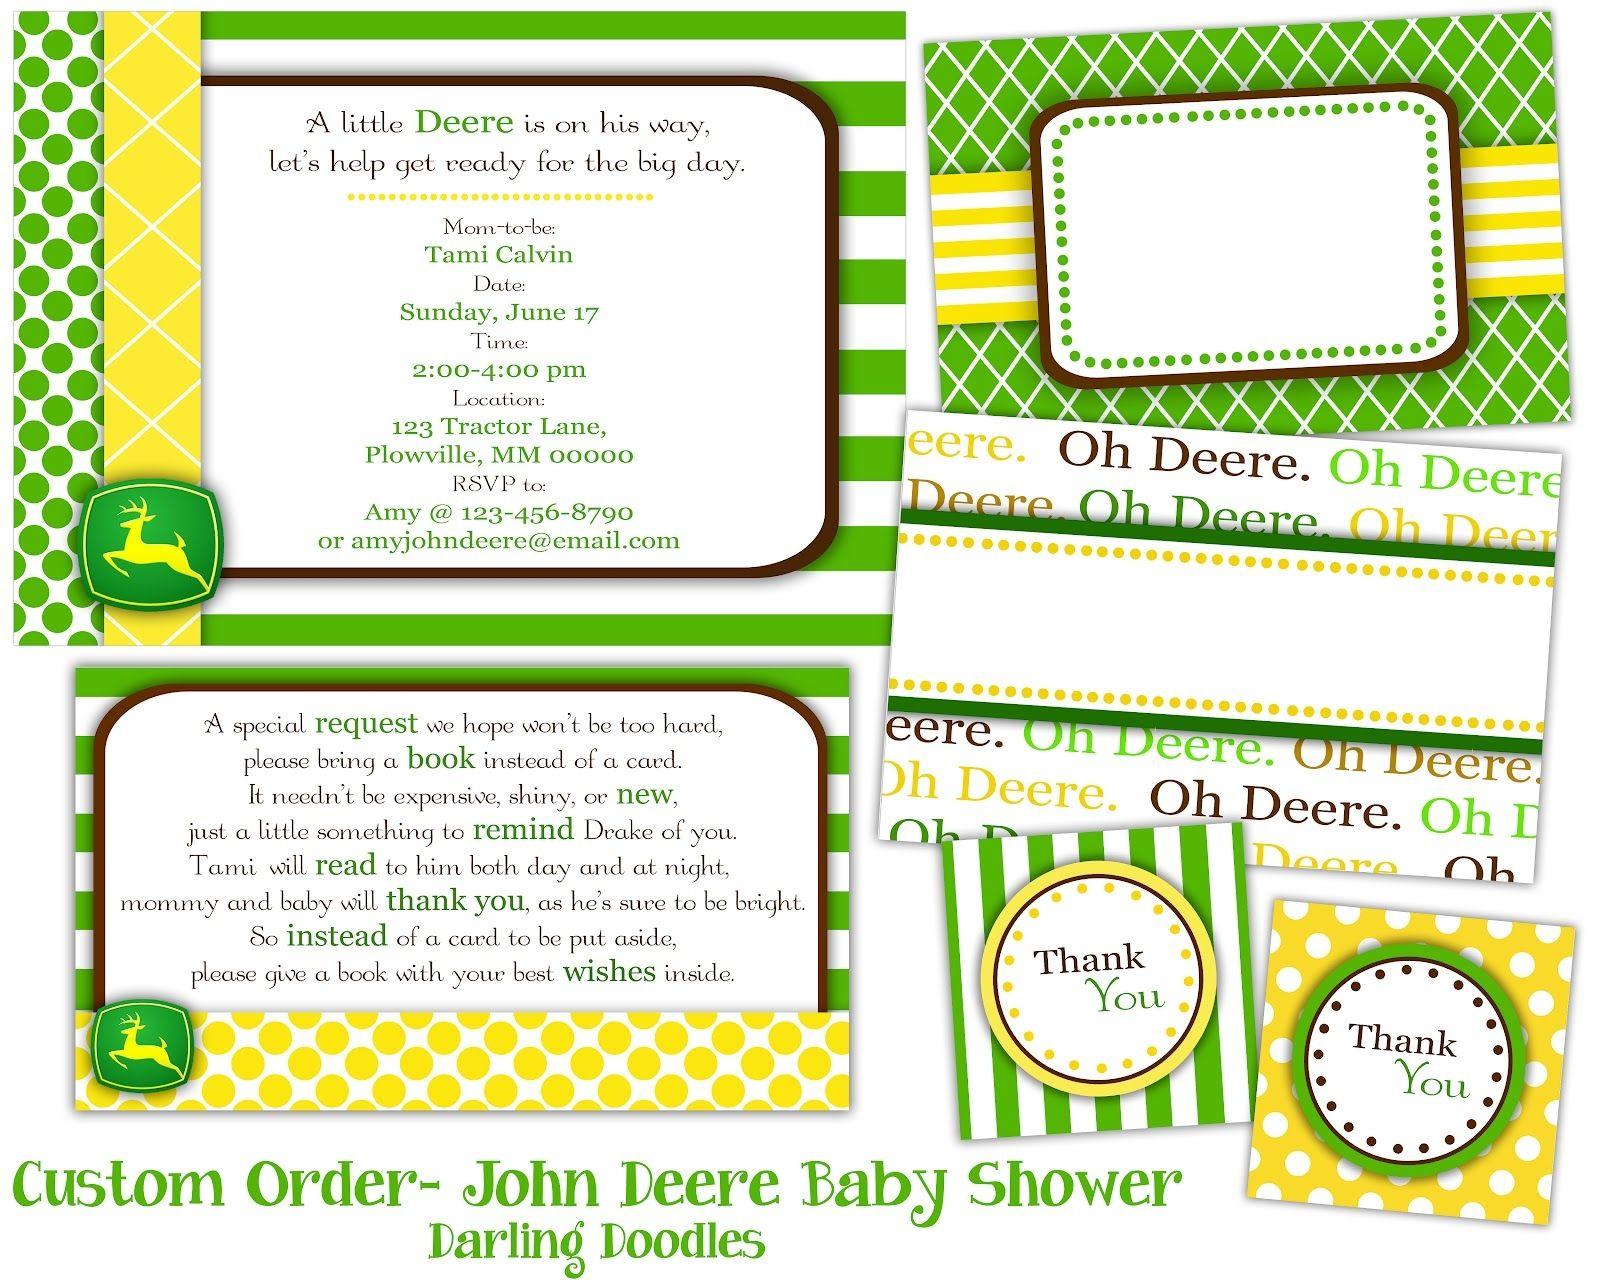 John Deere Baby Shower Invitation Ideas